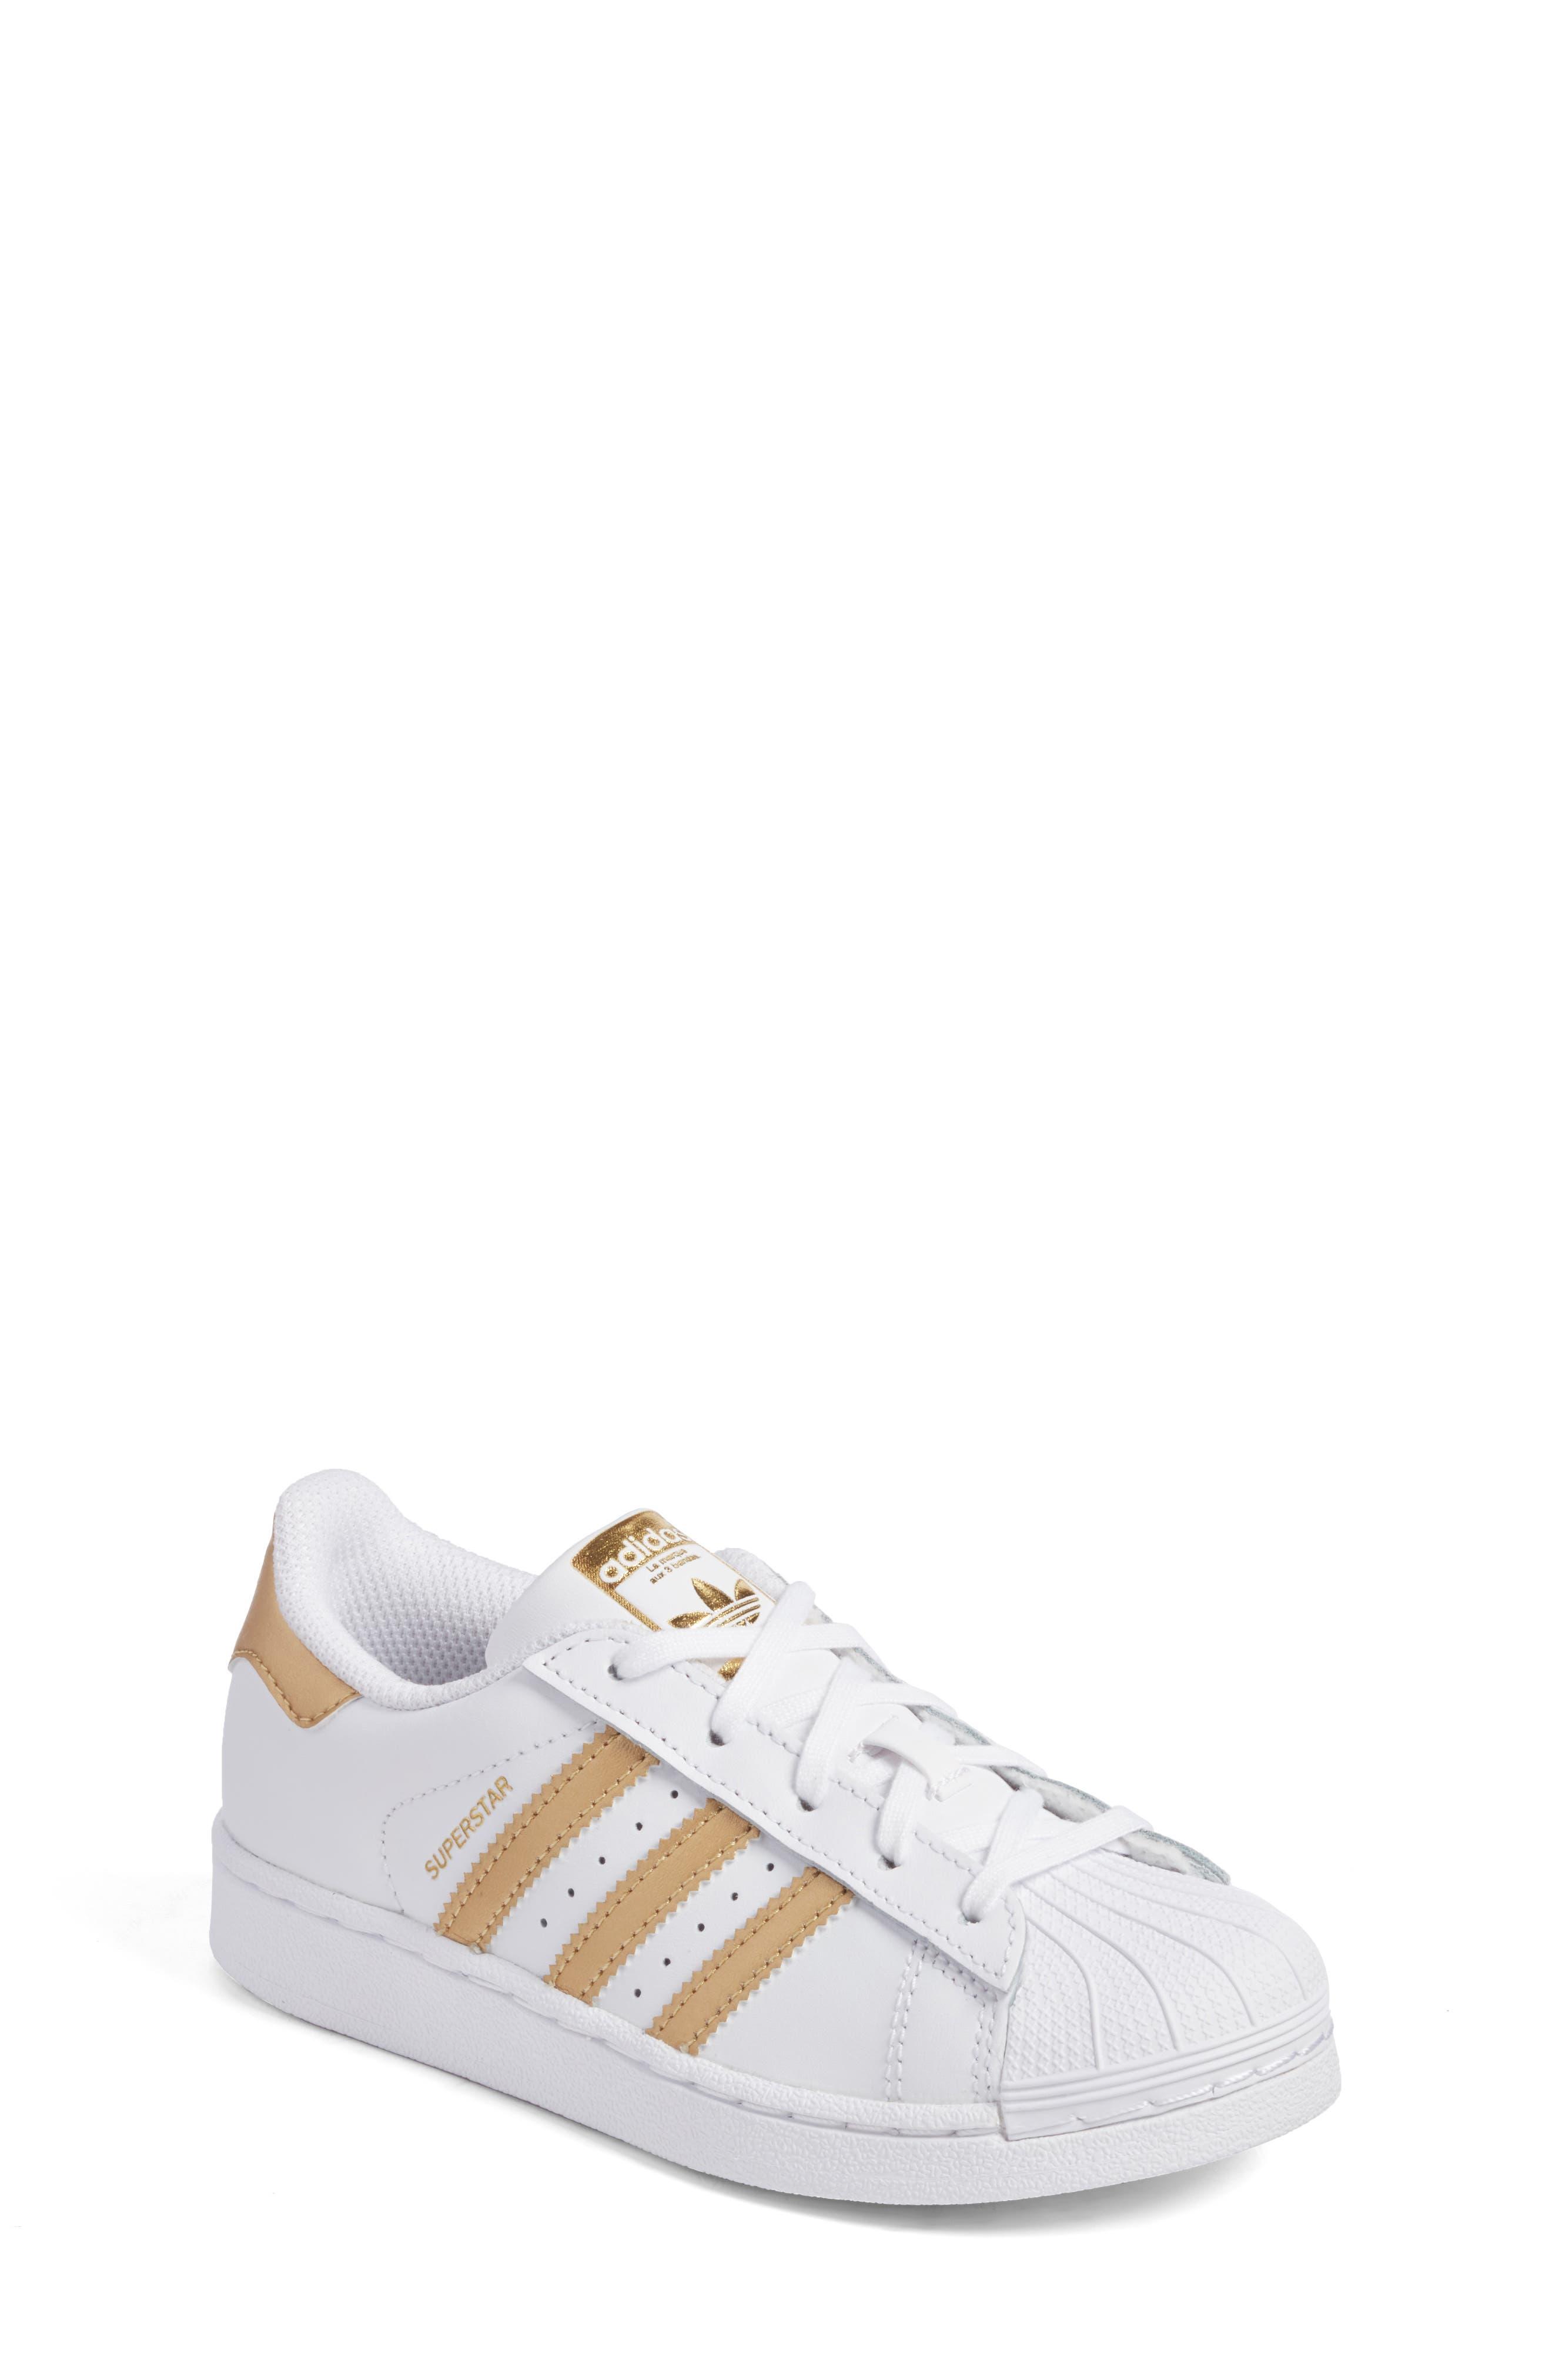 Main Image - adidas Superstar C Sneaker (Toddler & Little Kid)